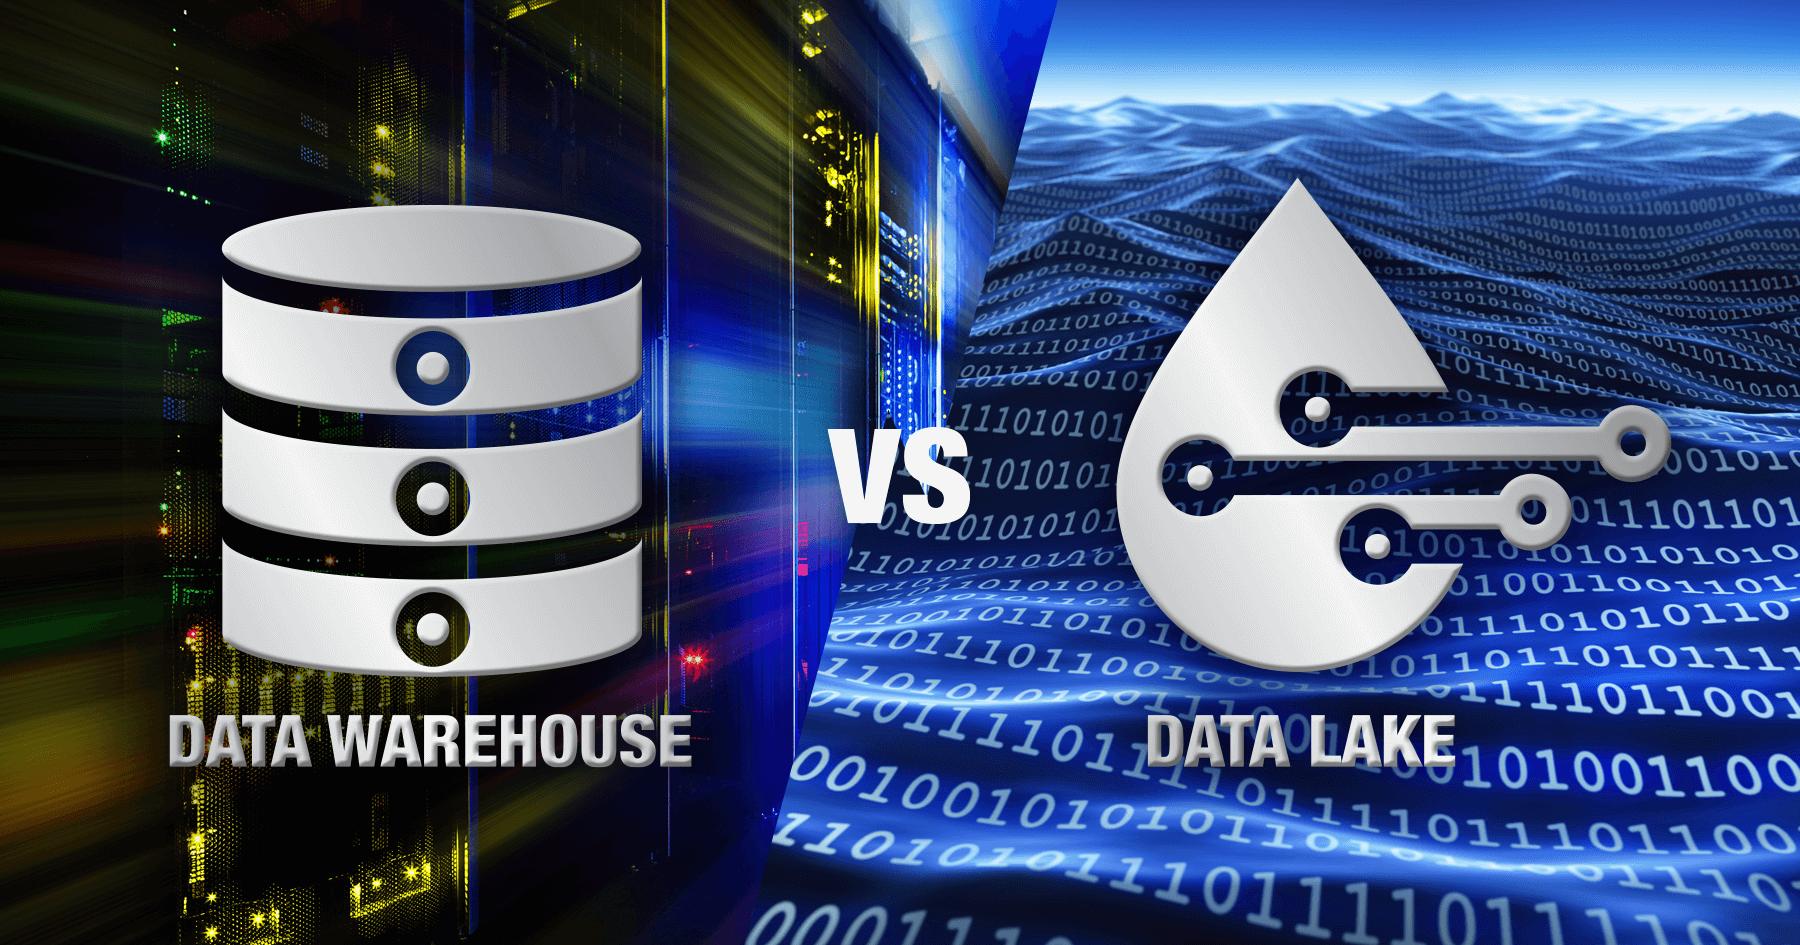 data lake vs data warehouse: the advantages and disadvantages of both